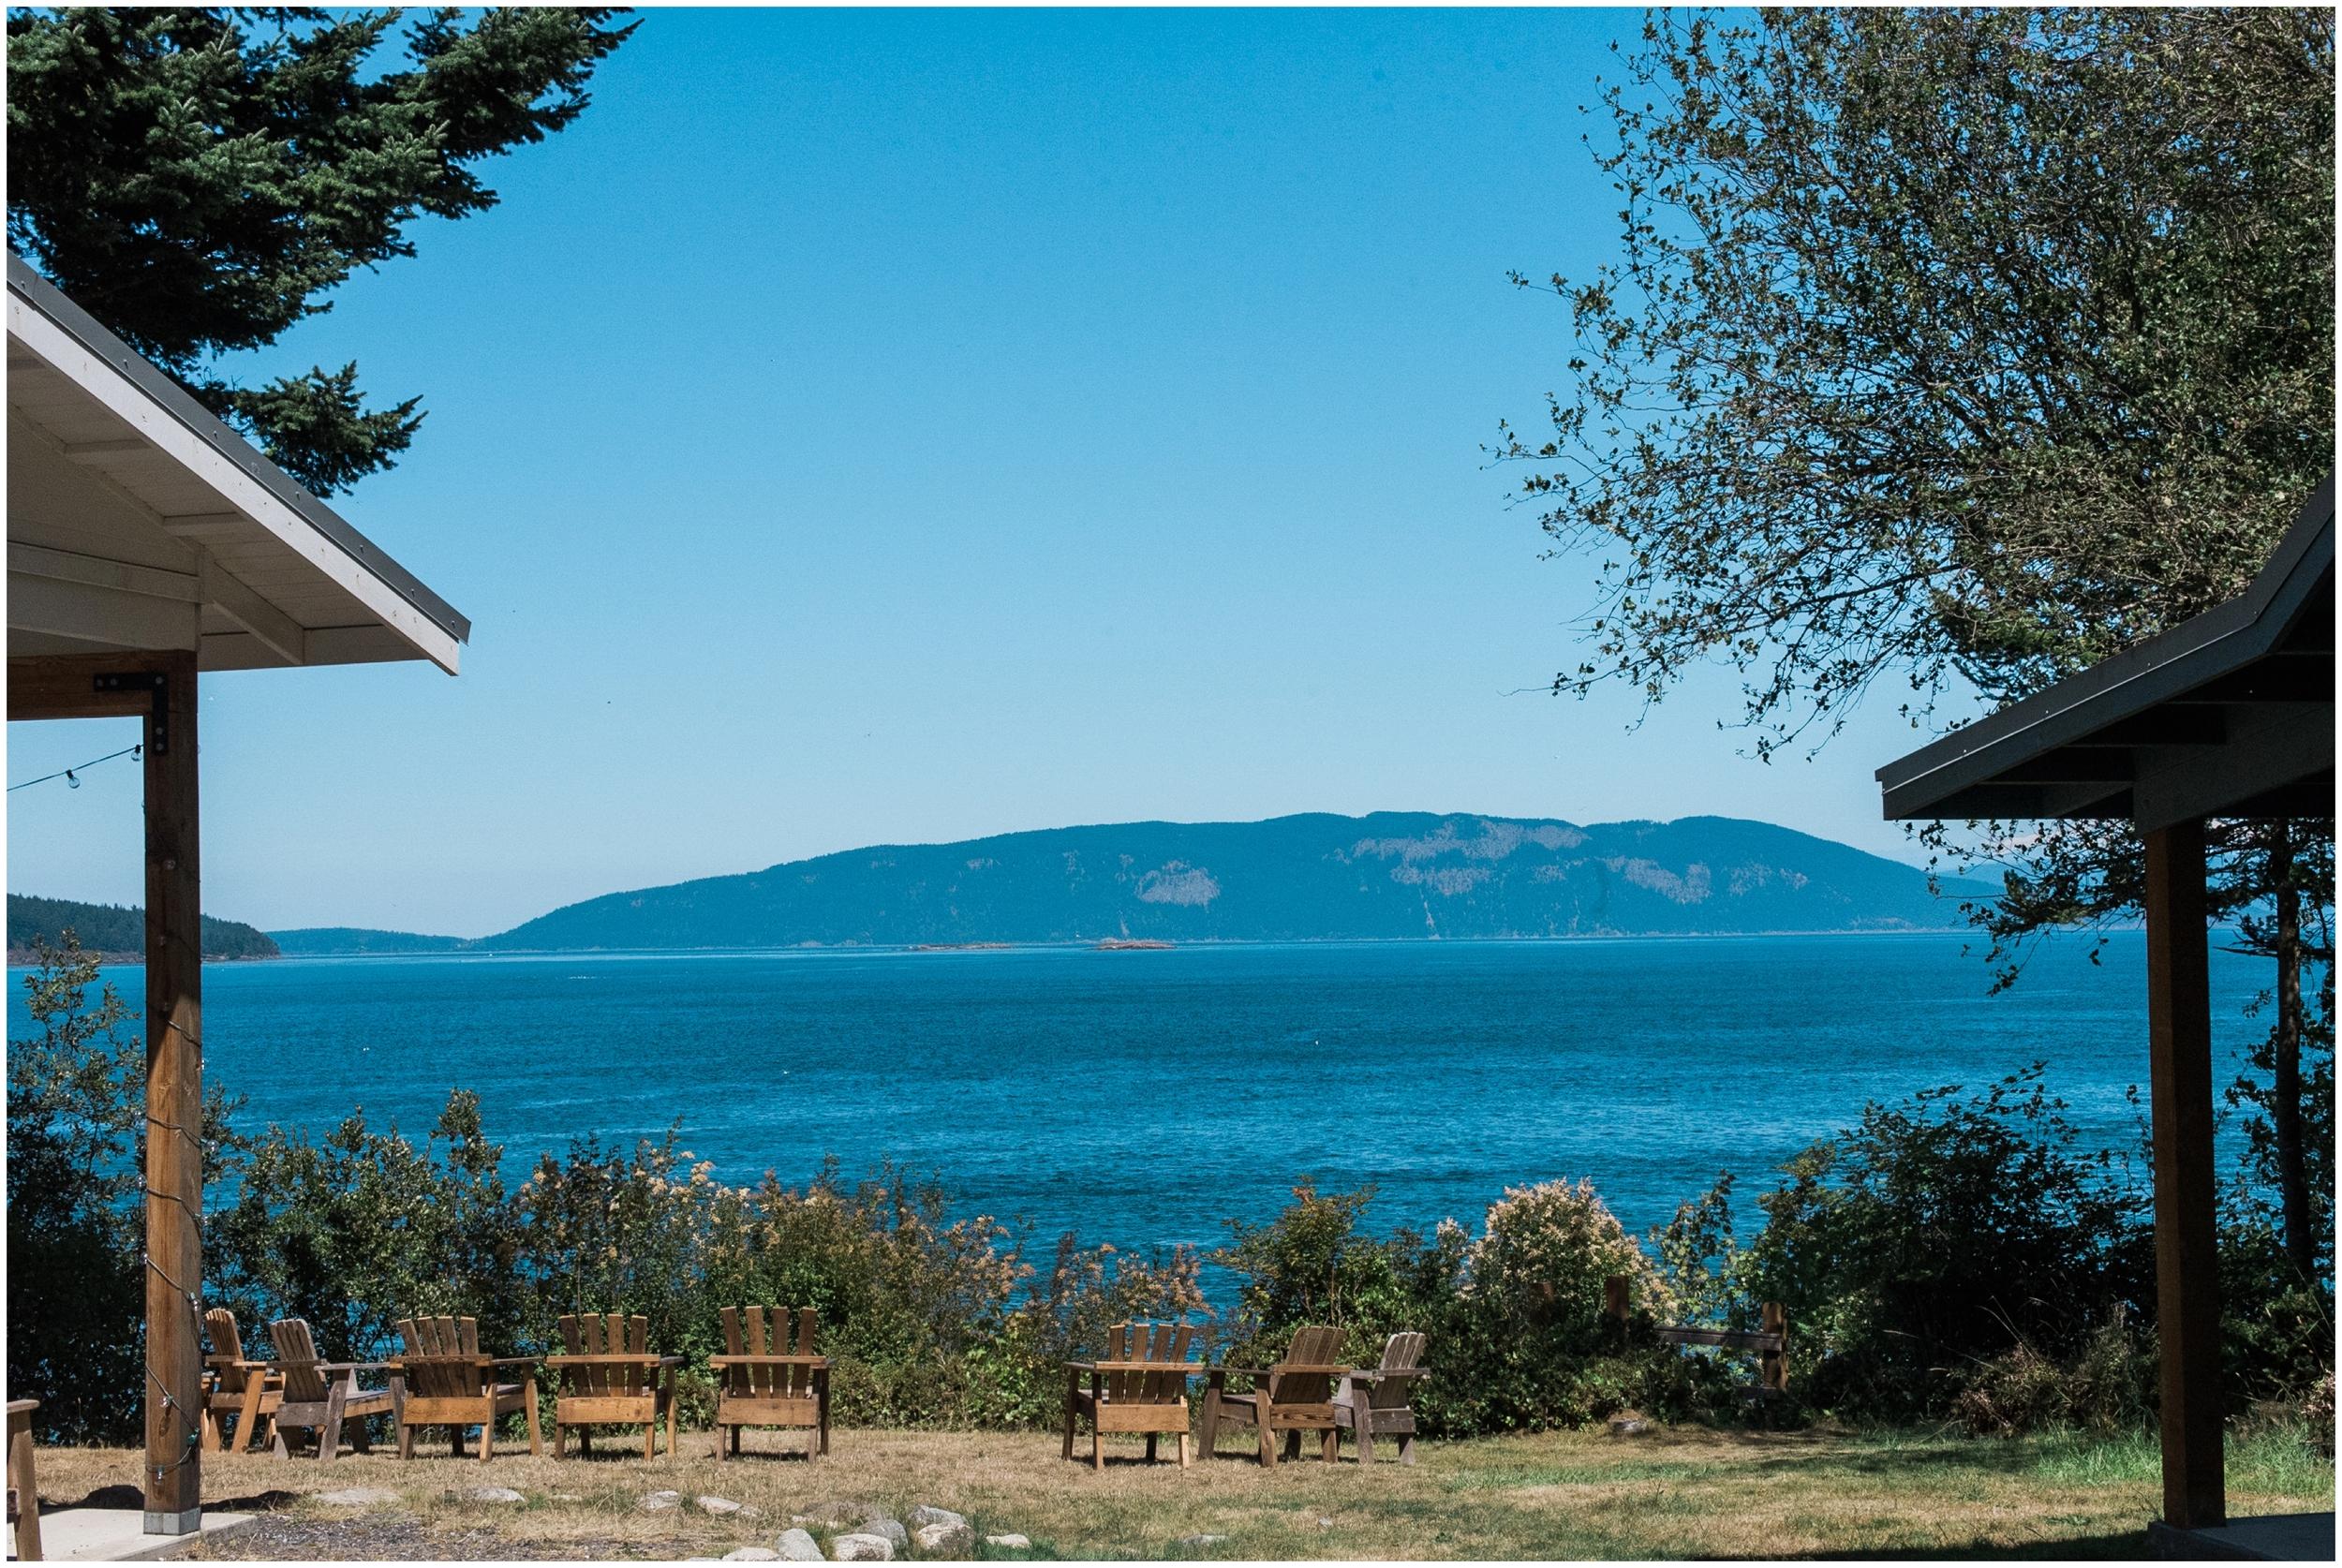 Orcas Island Wedding. San Juan Island Wedding. Bayside Cottages. Pacific Northwest. Destination Wedding. Eastsound. Rosario Resort. Nautical. coastal. Intimate. Blended Family. Anchors.